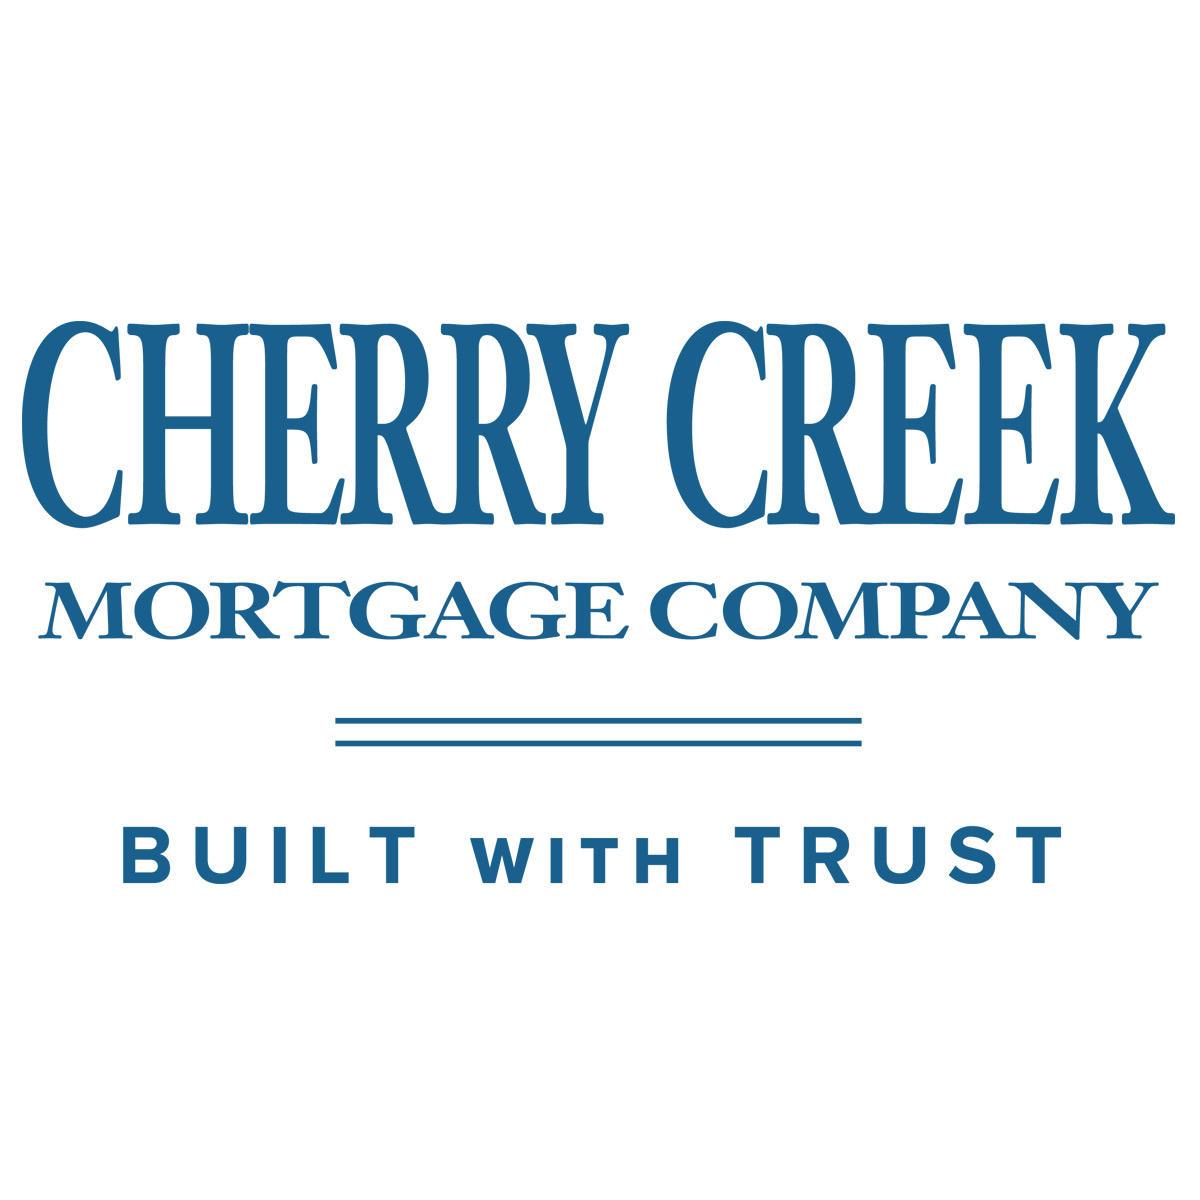 Cherry Creek Mortgage Company   Jennifer Thompson